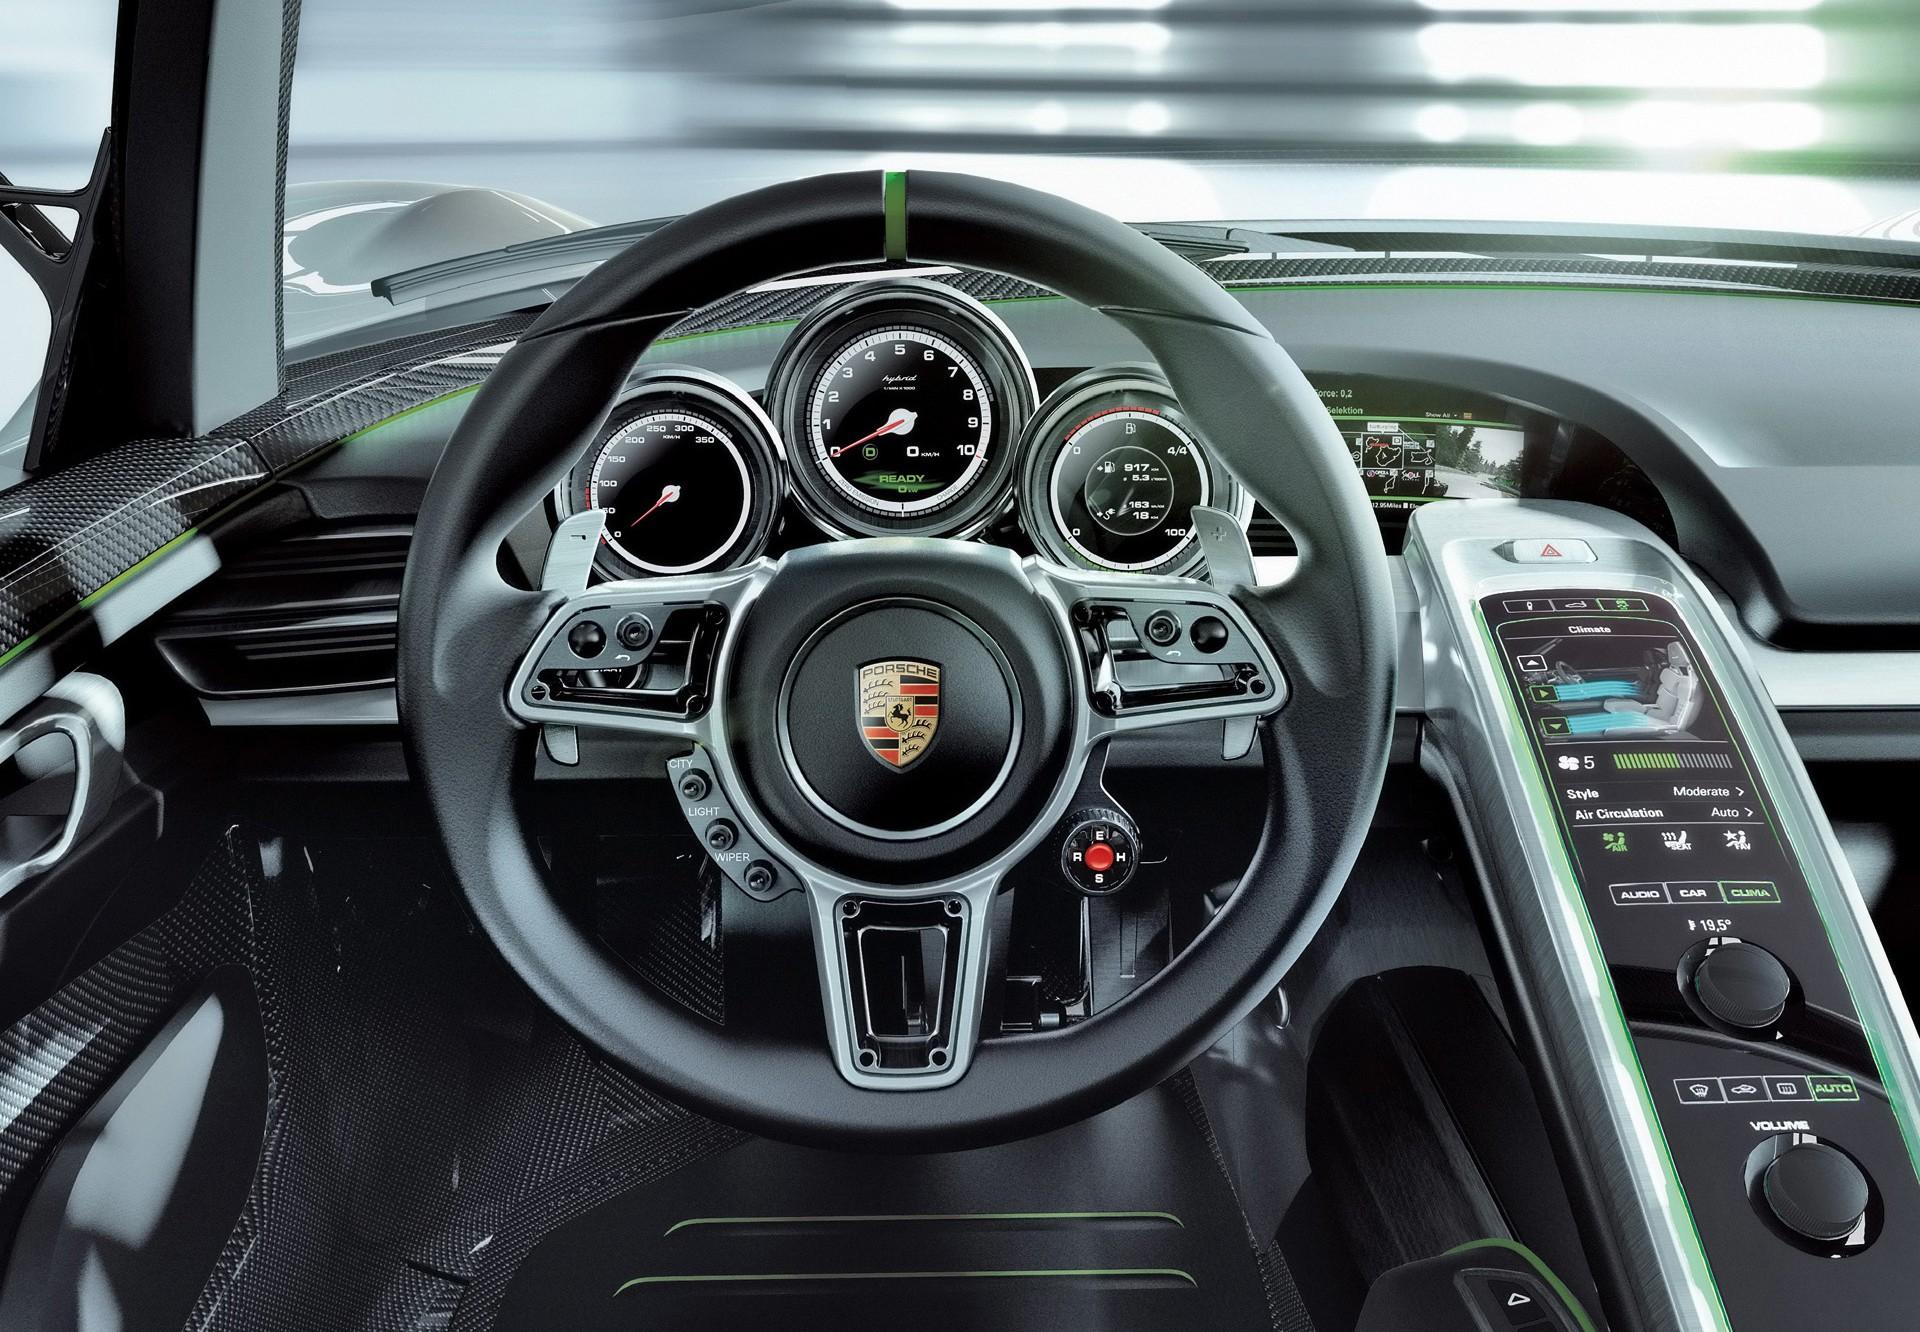 porsche 918 roadster 2012 porsche 918 roadster 2012 - Porsche Spyder 2012